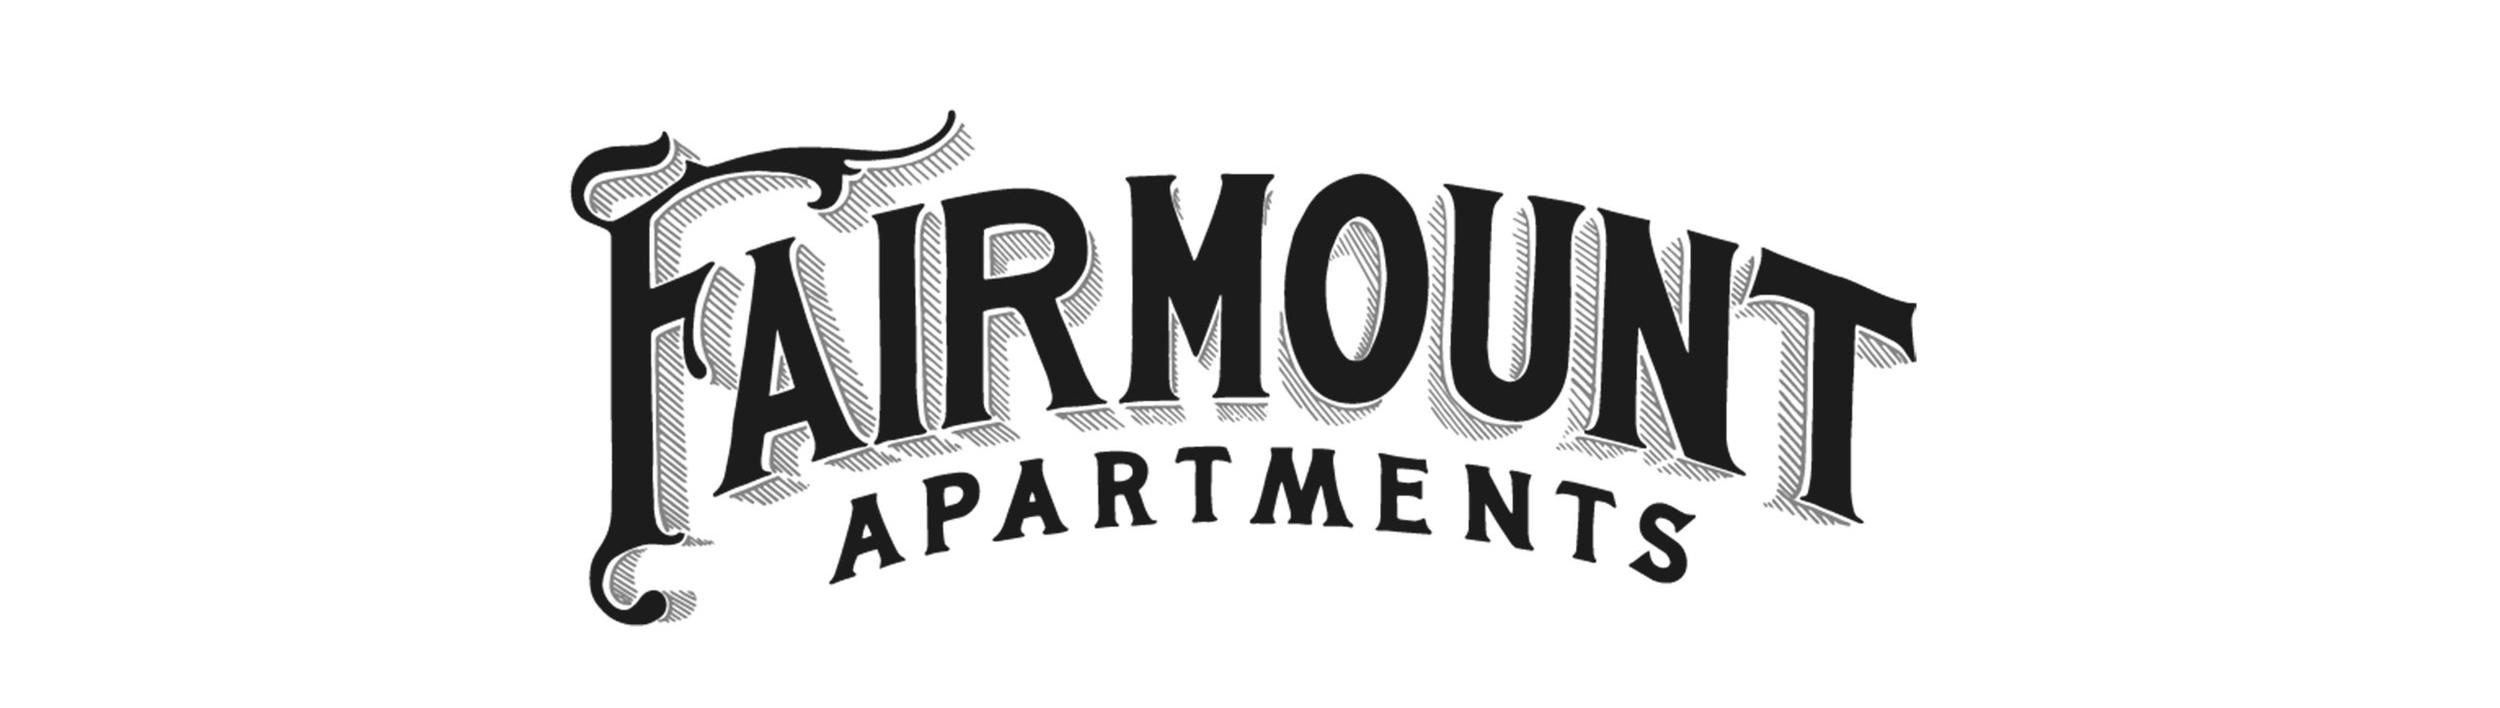 Fairmount_master_logo_.jpg